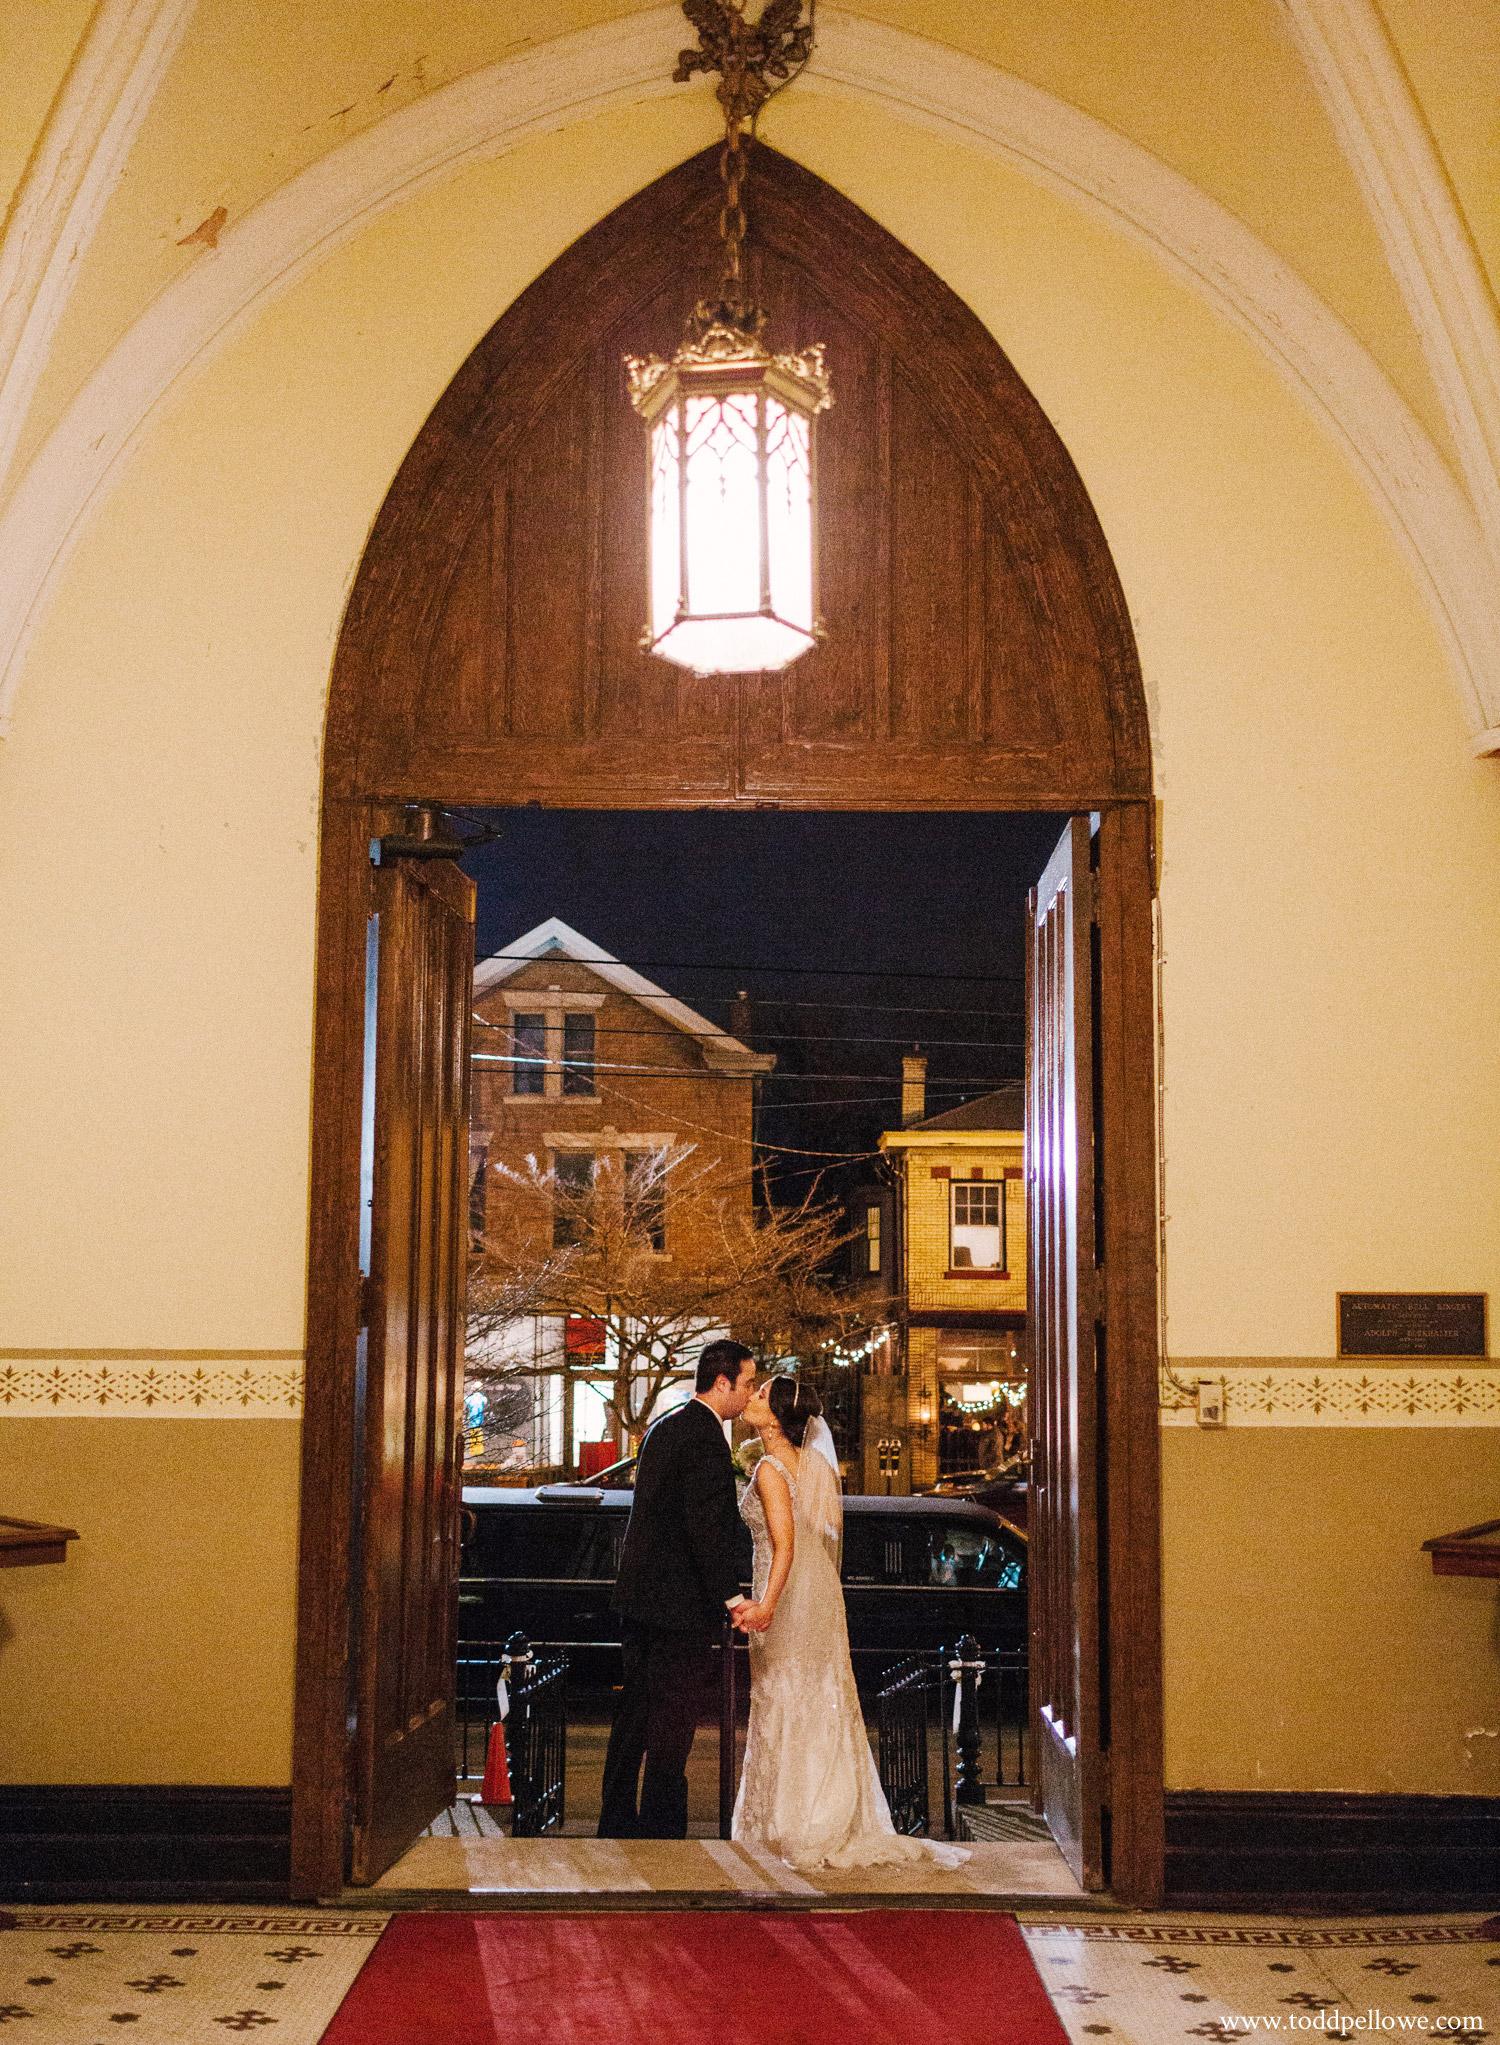 18-frazier-arms-museum-wedding-louisville-433.jpg